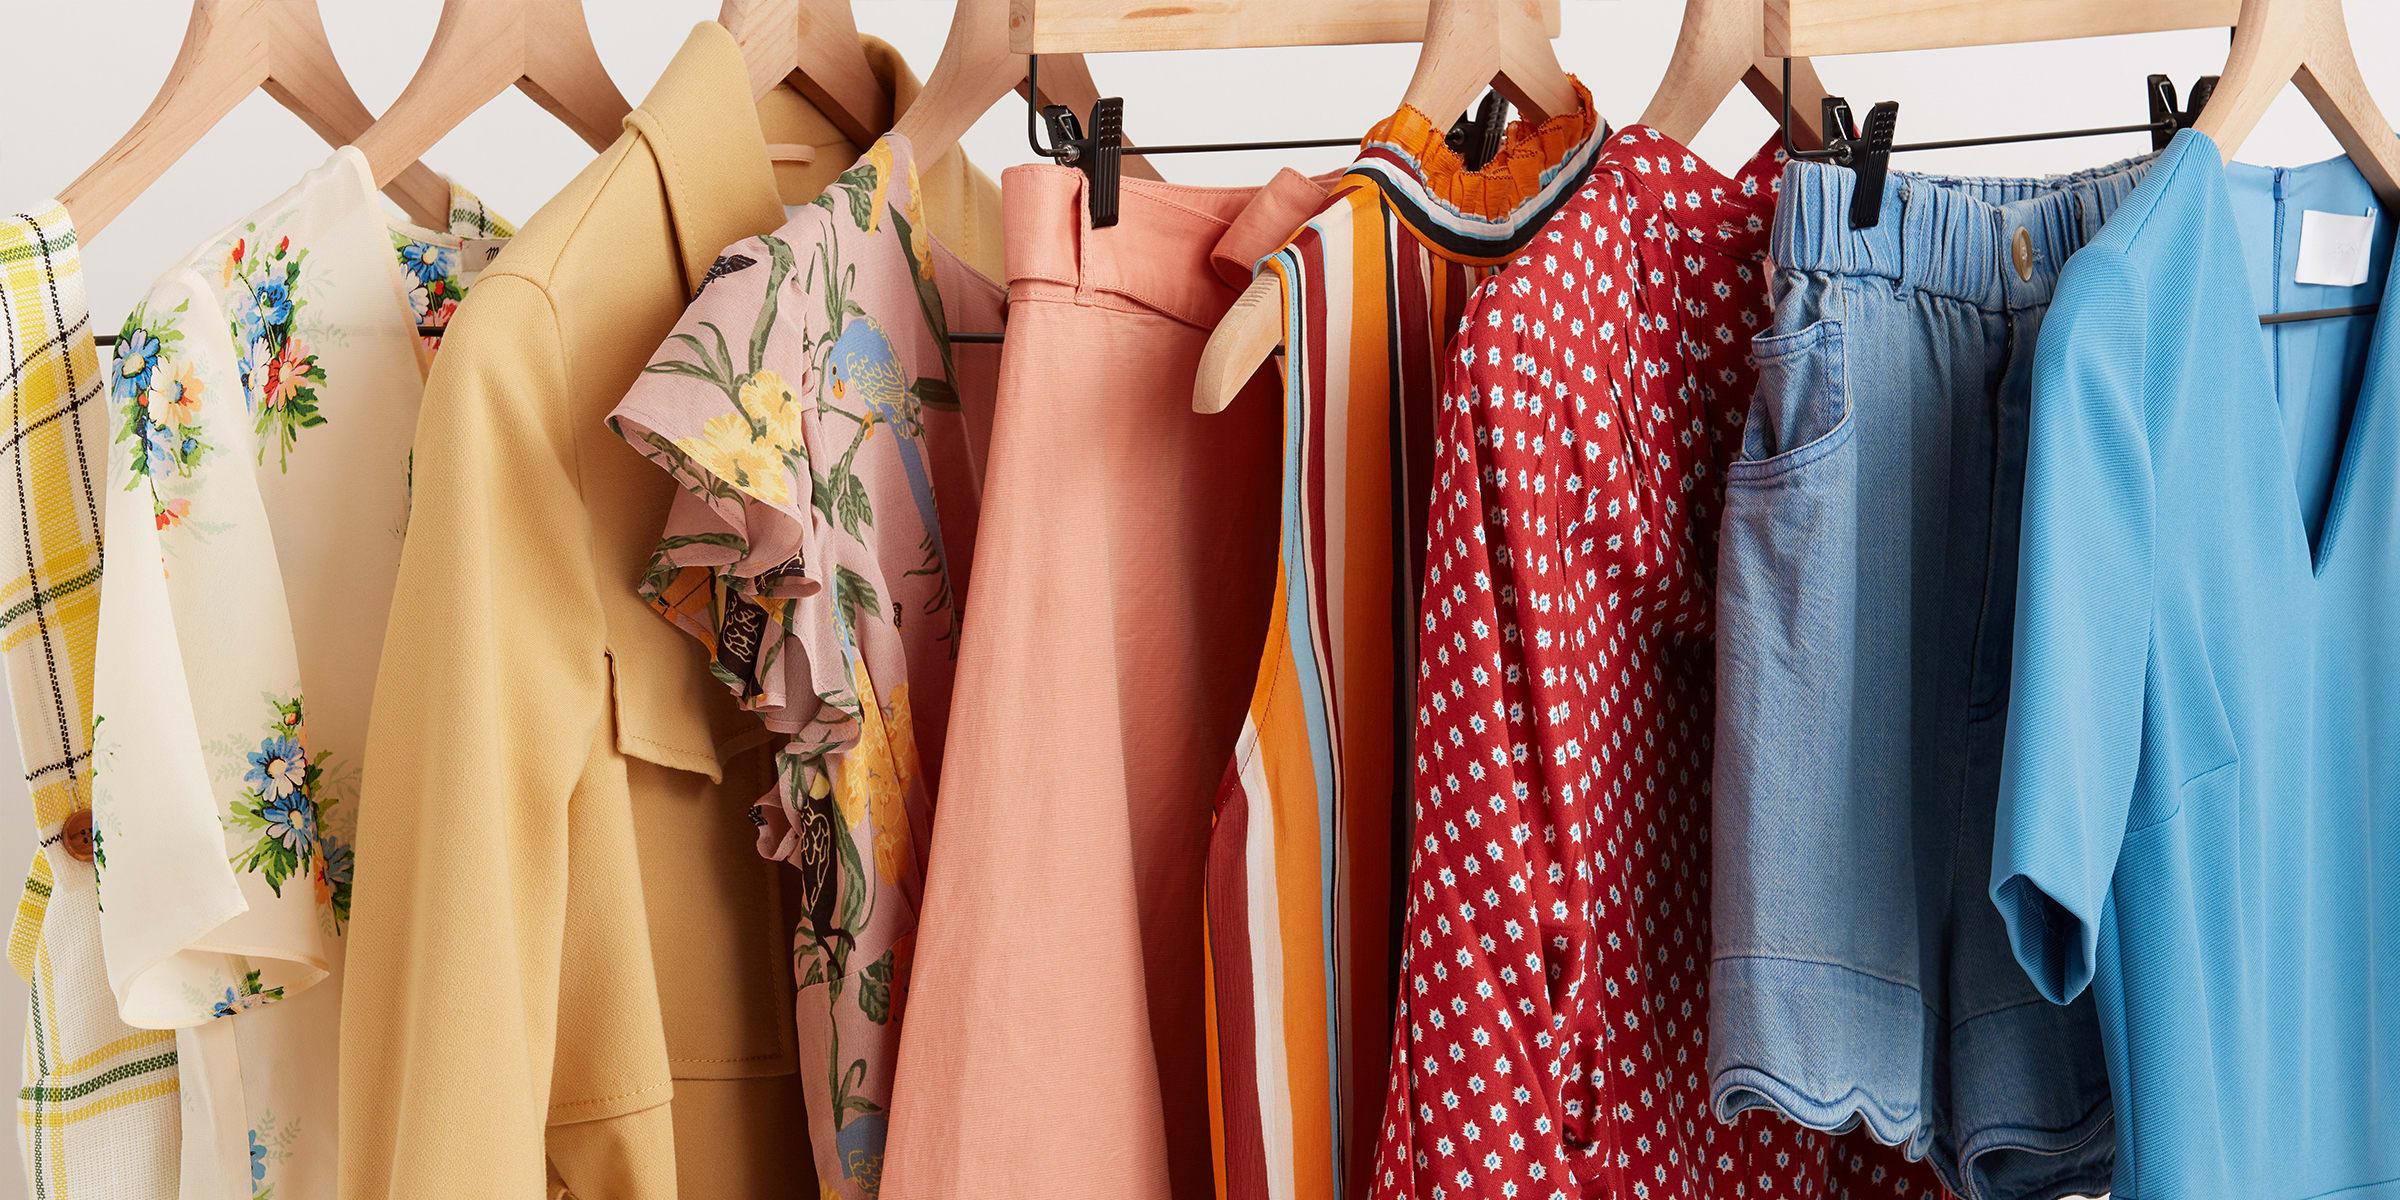 Rack of cloths.